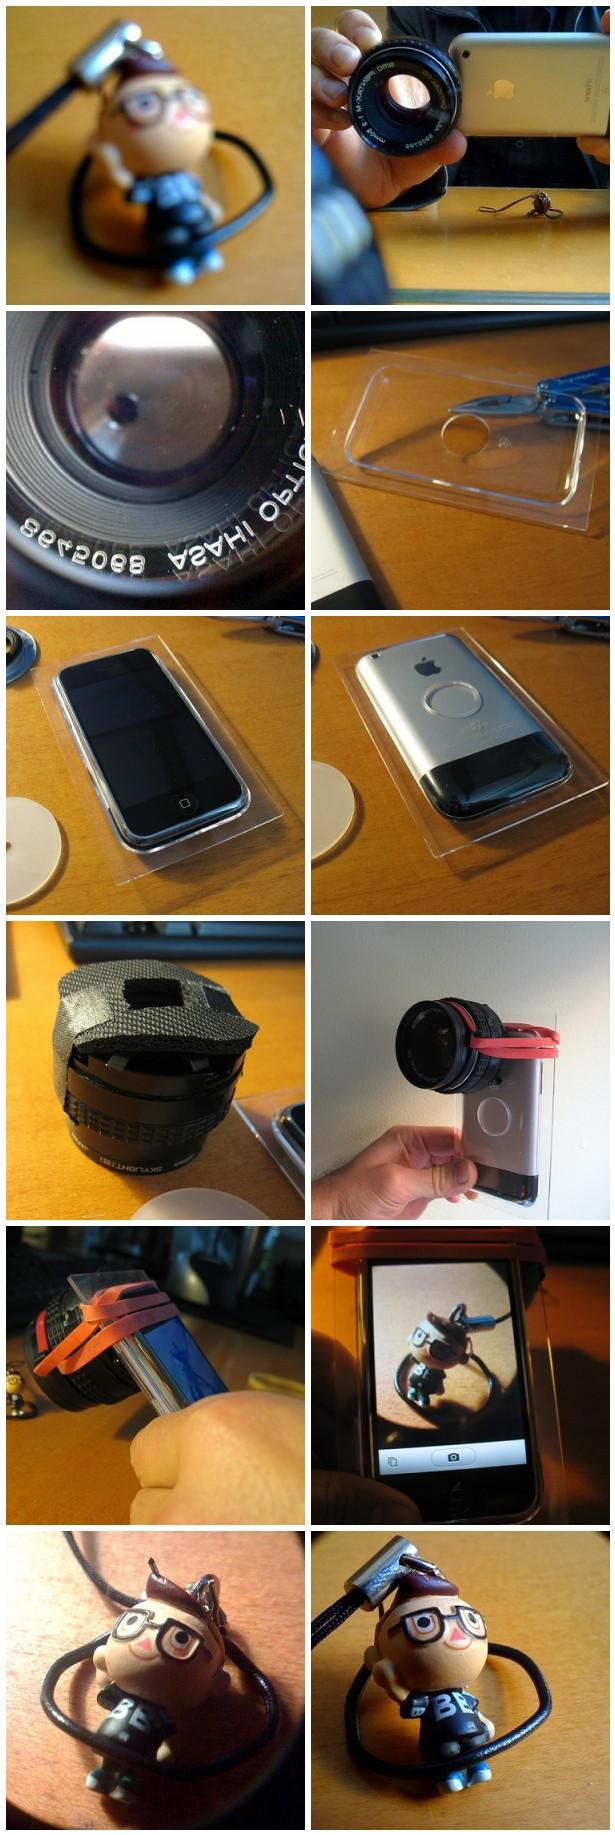 macroPhone – an iPhone macro lens